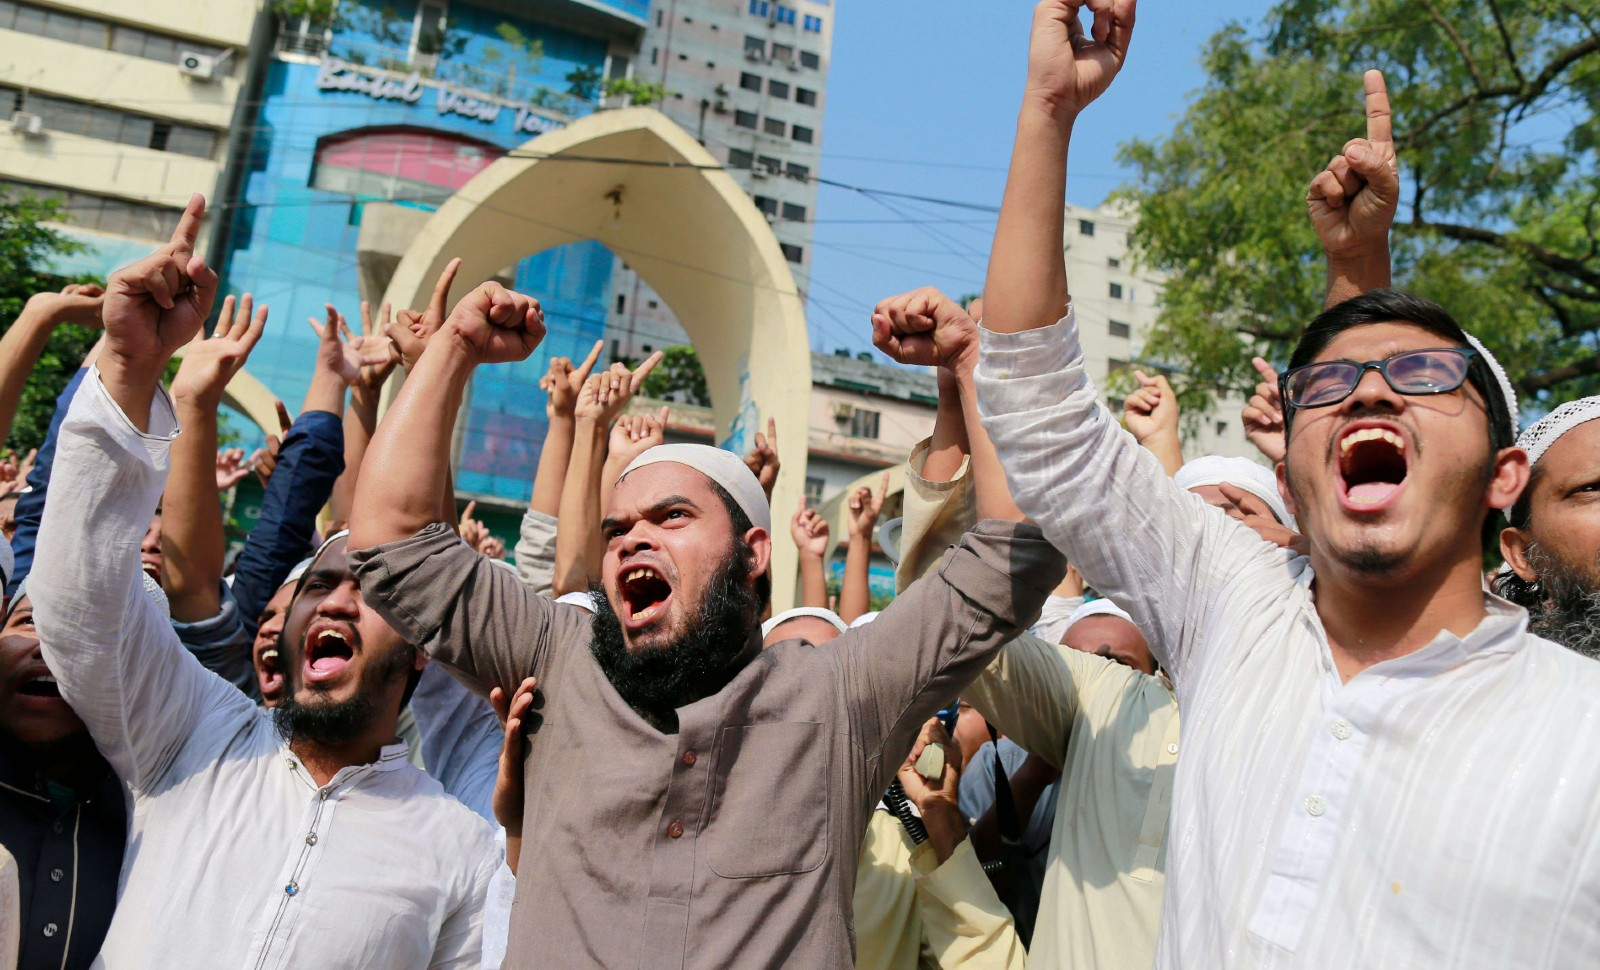 Manifestations contre la France à Dhaka, Bangladesh, le 28 octobre 2020 © Suvra Kanti Das/Shutterstock/SIPA Numéro de reportage: Shutterstock40801396_000040.